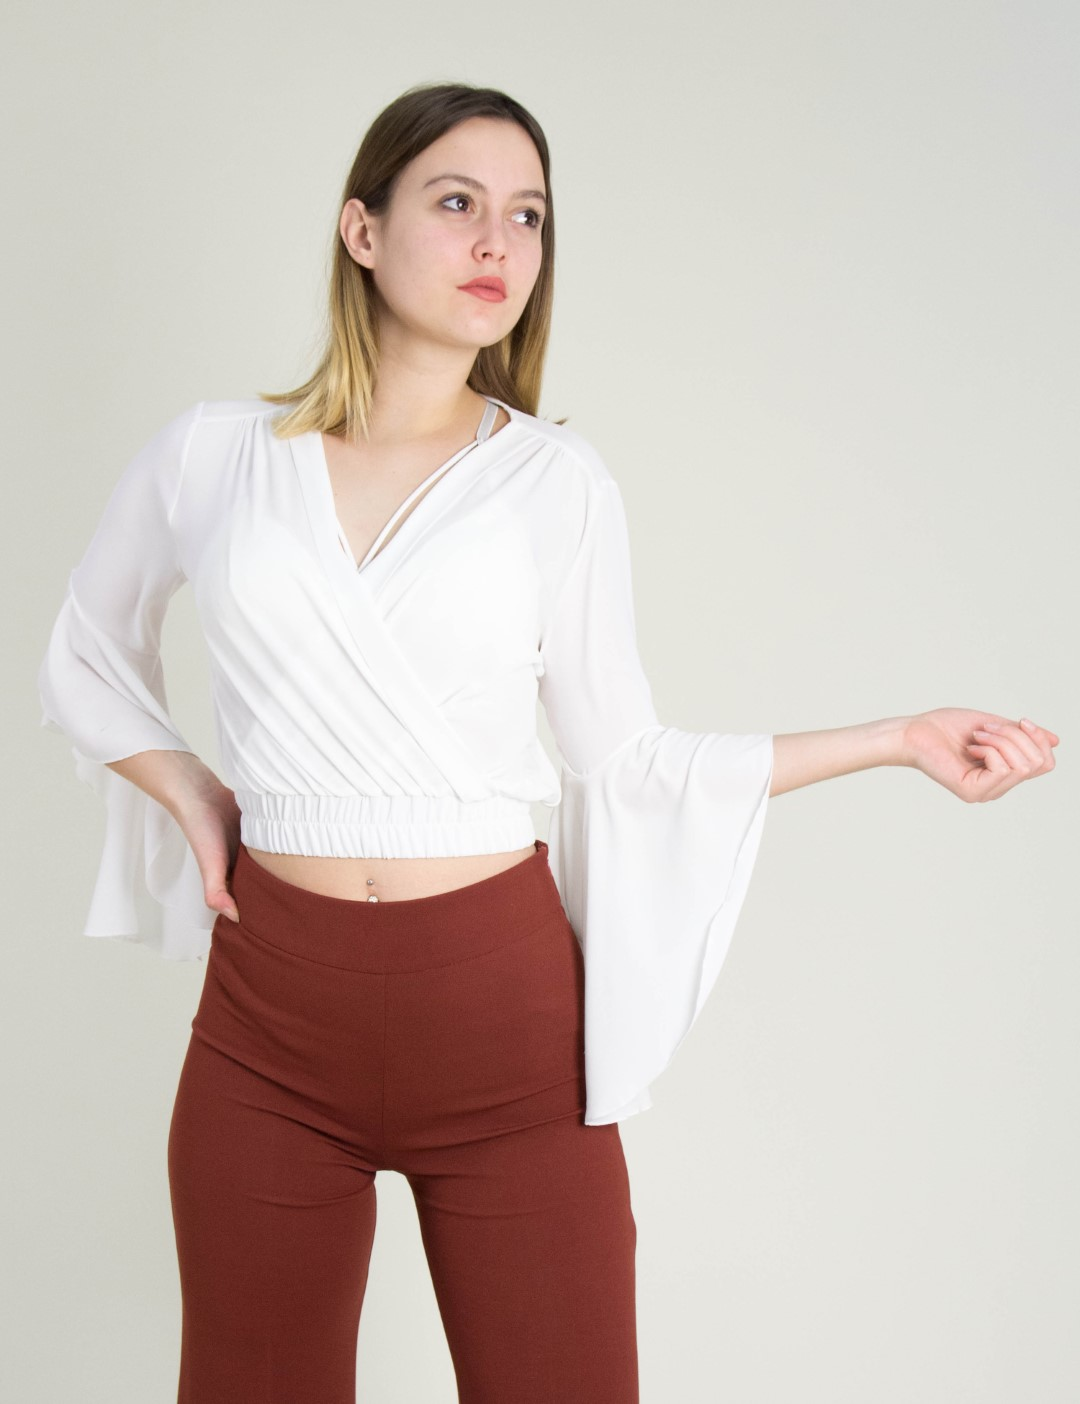 619a718e99c6 Γυναικεία κόκκινη μπλούζα με ράντες μονόχρωμη άνοιγμα 1180155F. 15.21 € στο  ToRouxo.gr. Γυναικεία λευκή σιφόν κρουαζέ μπλούζα βολάν Cocktail 014206000B